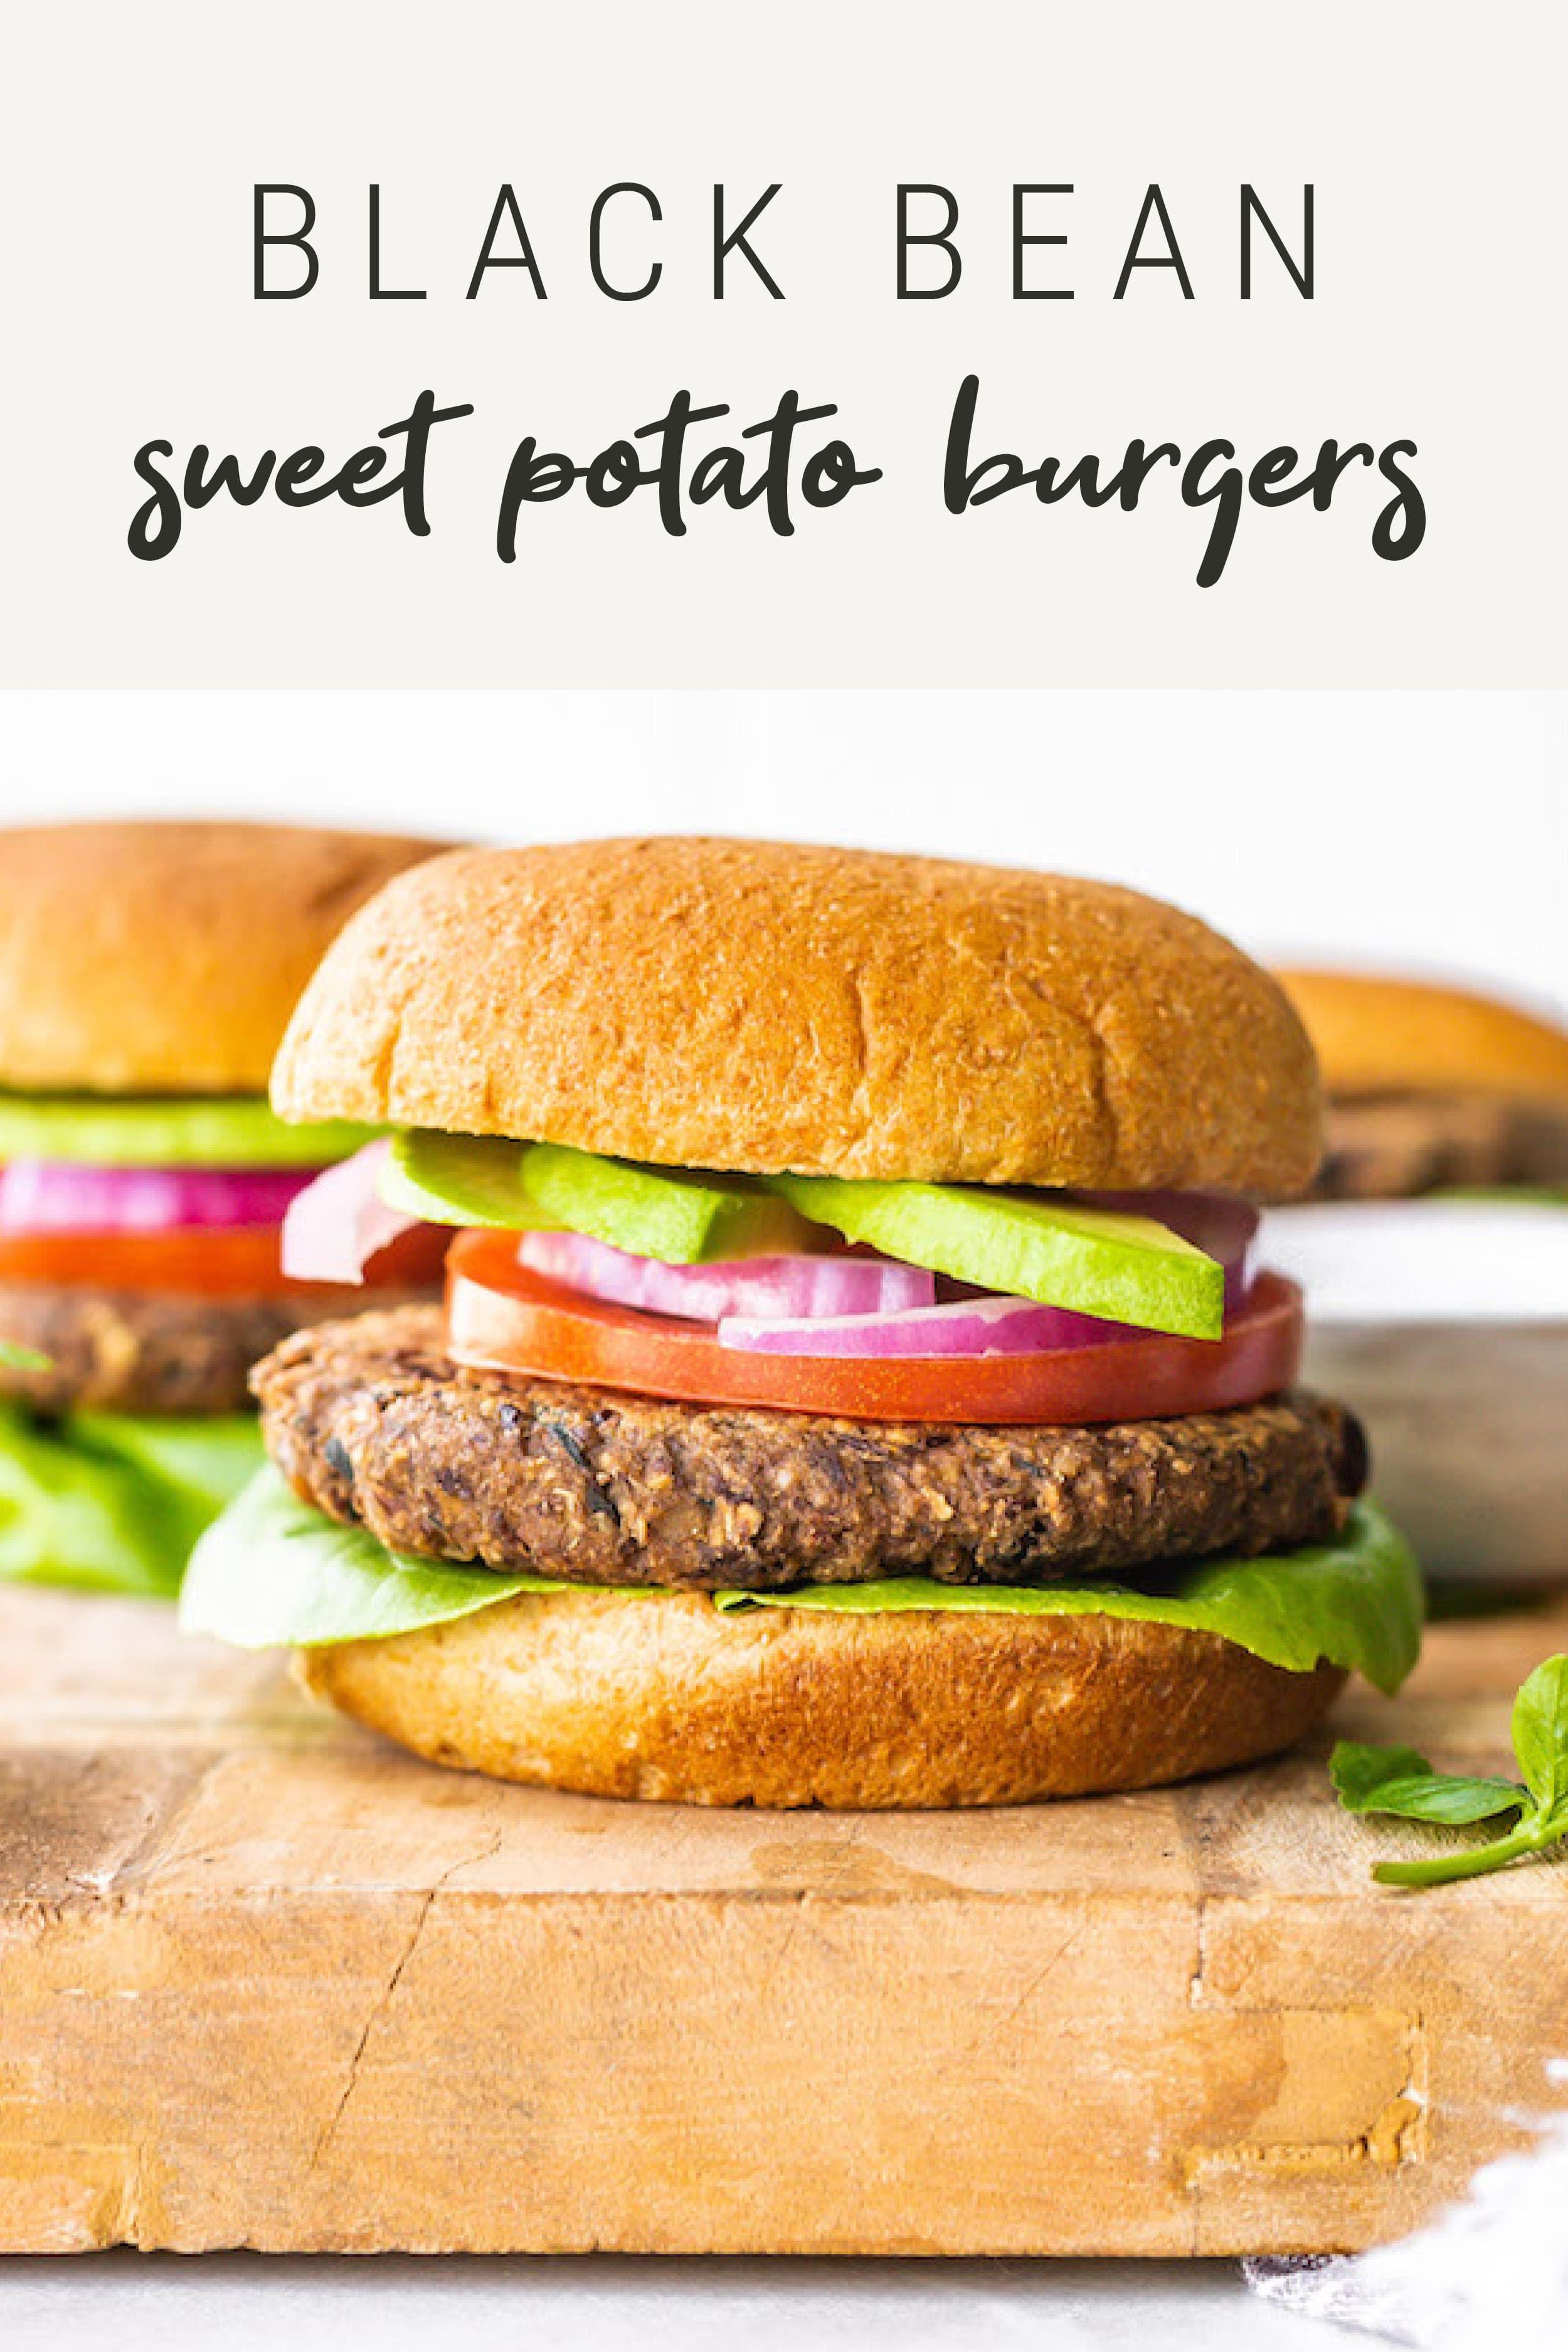 Black Bean Sweet Potato Burger Recipe Eating Bird Food Recipe In 2020 Sweet Potato Burgers Recipes Lunch Recipes Healthy